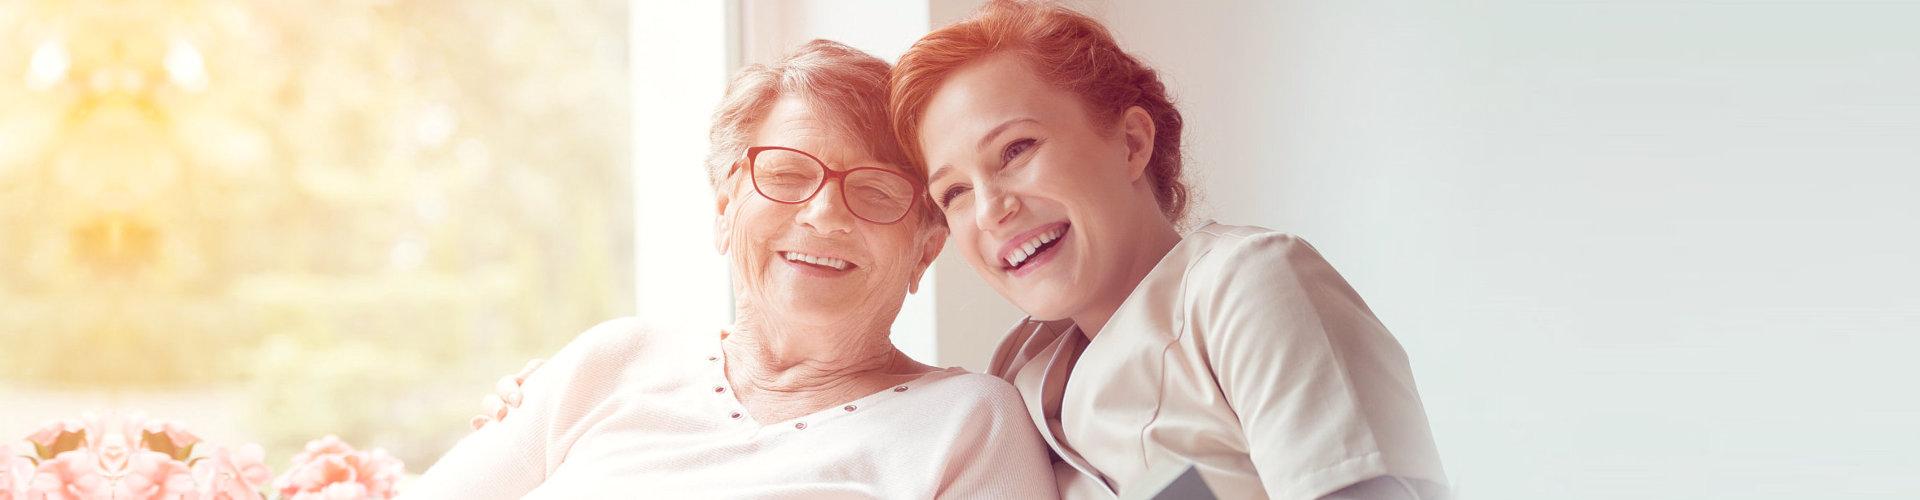 senior woman and caregiver smiling